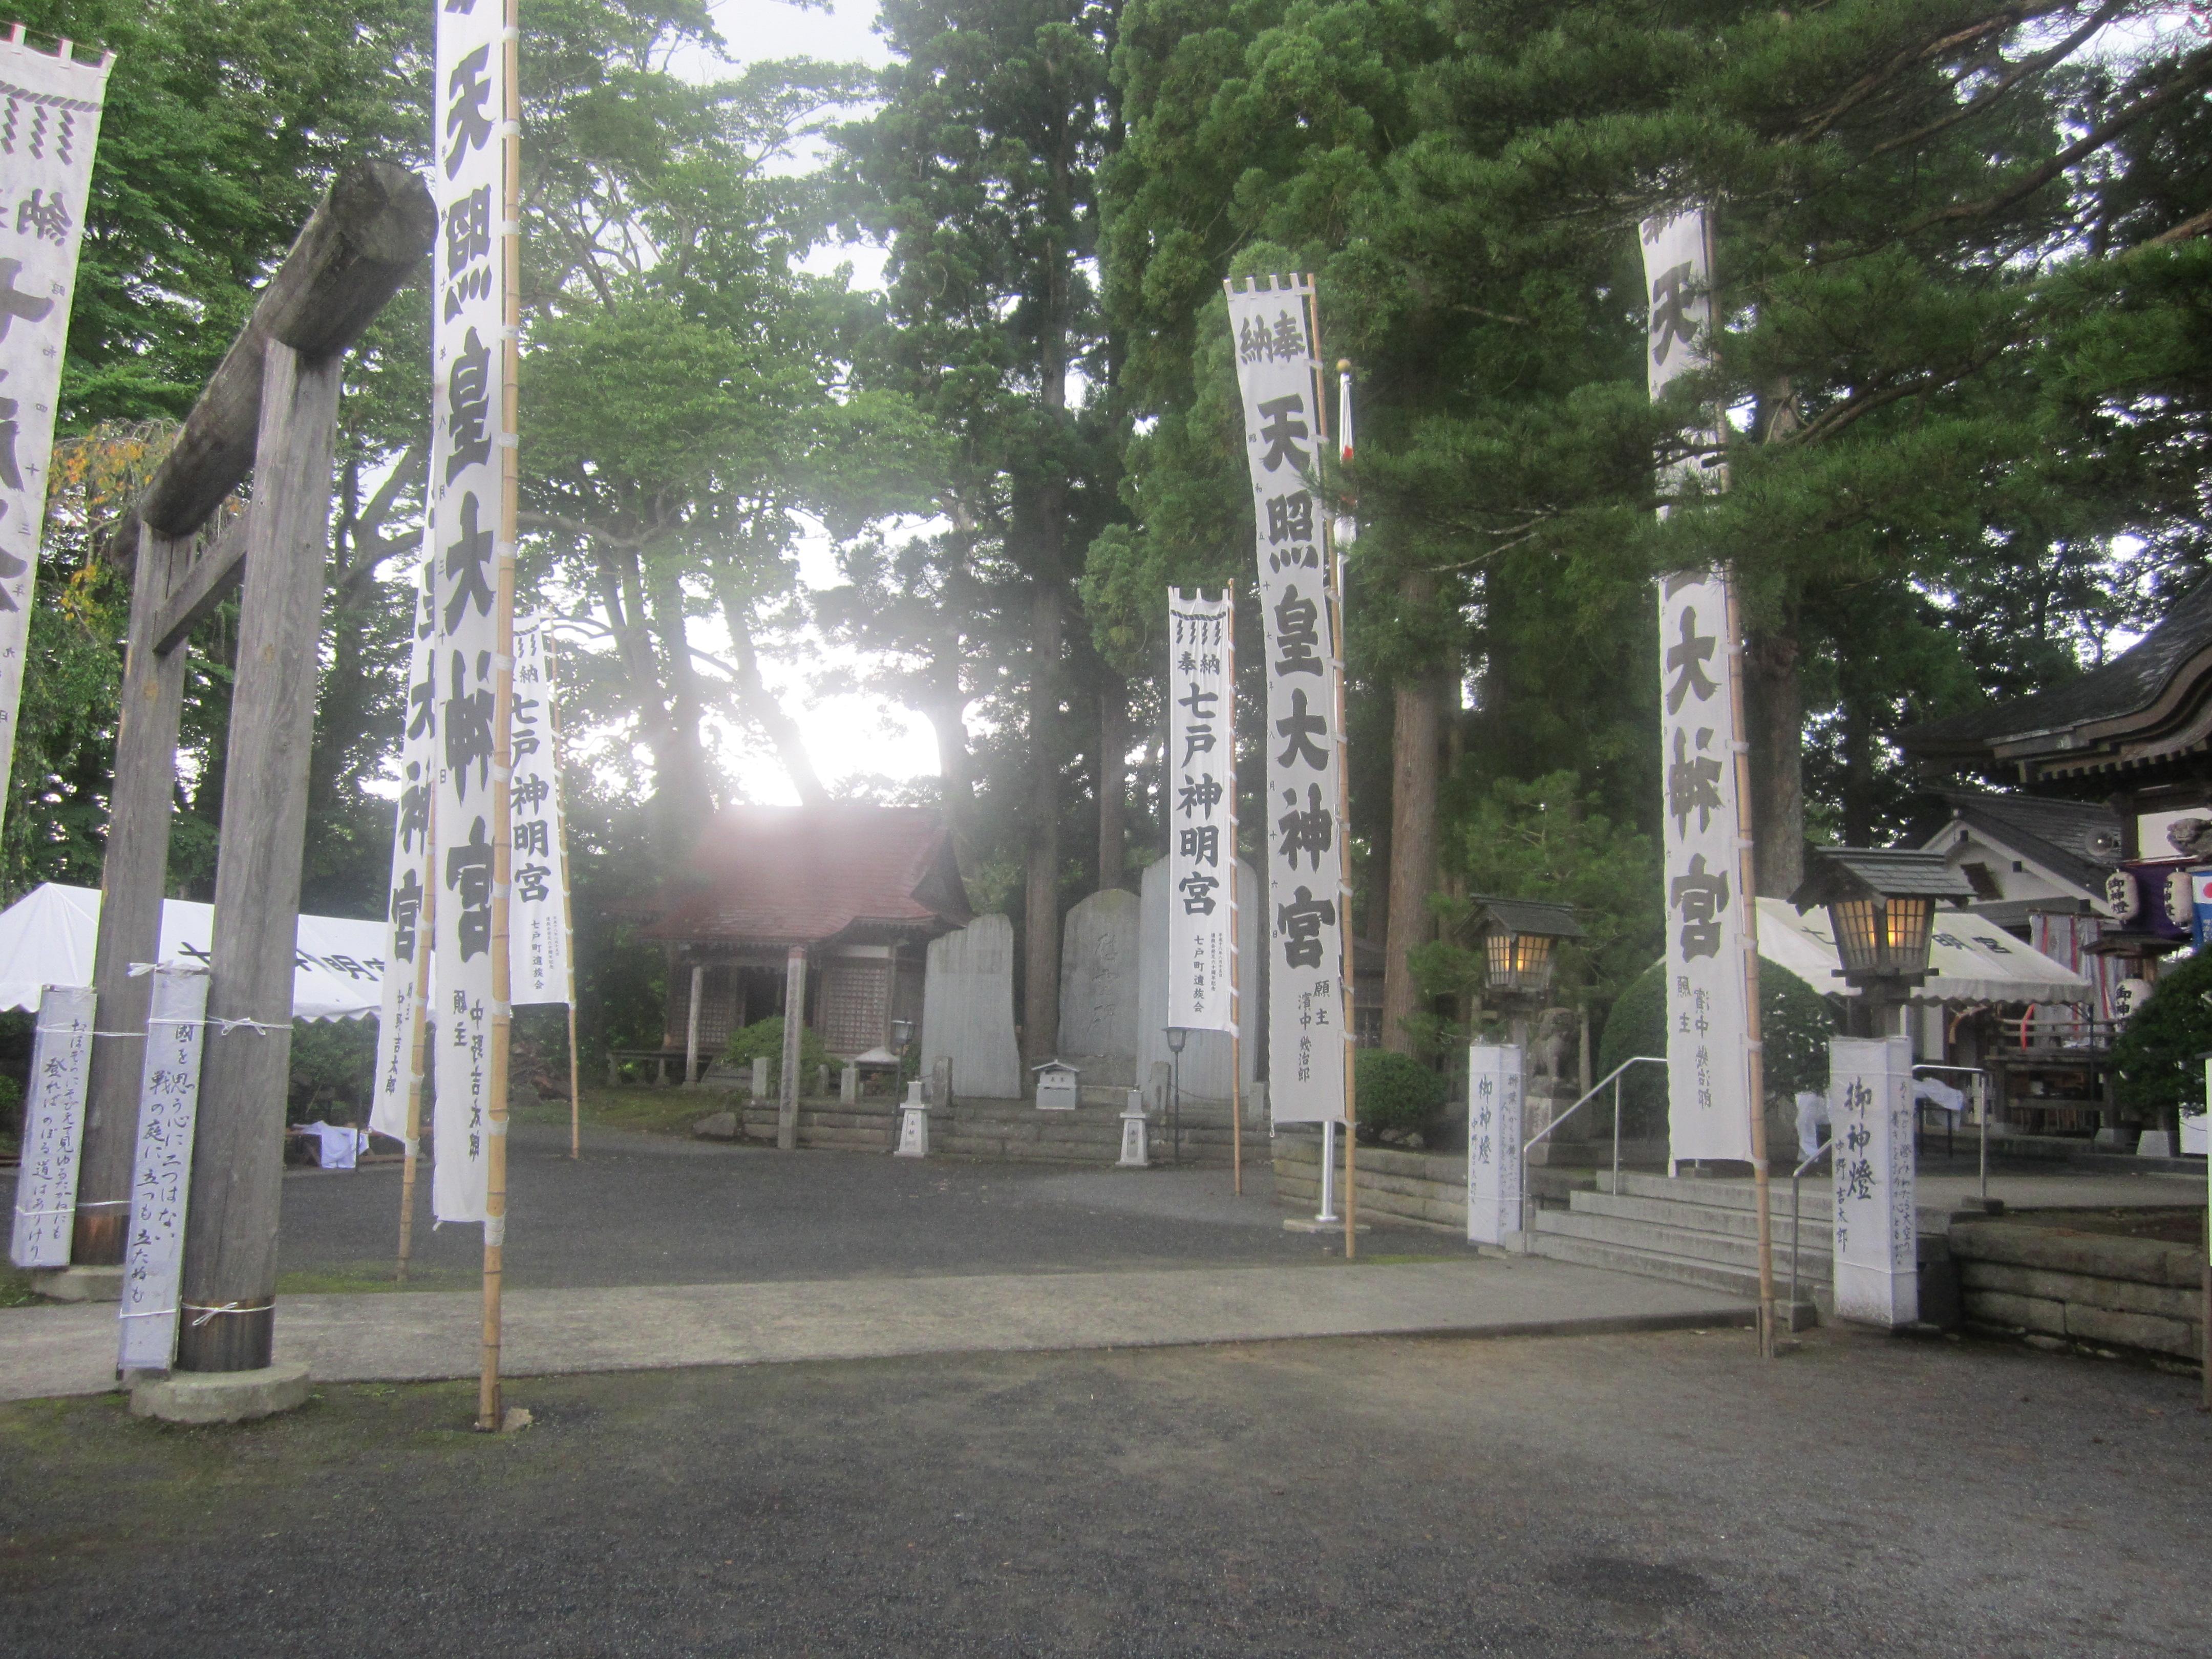 IMG 4228 - 麻布十番納涼祭り25,26日(七戸町出店)